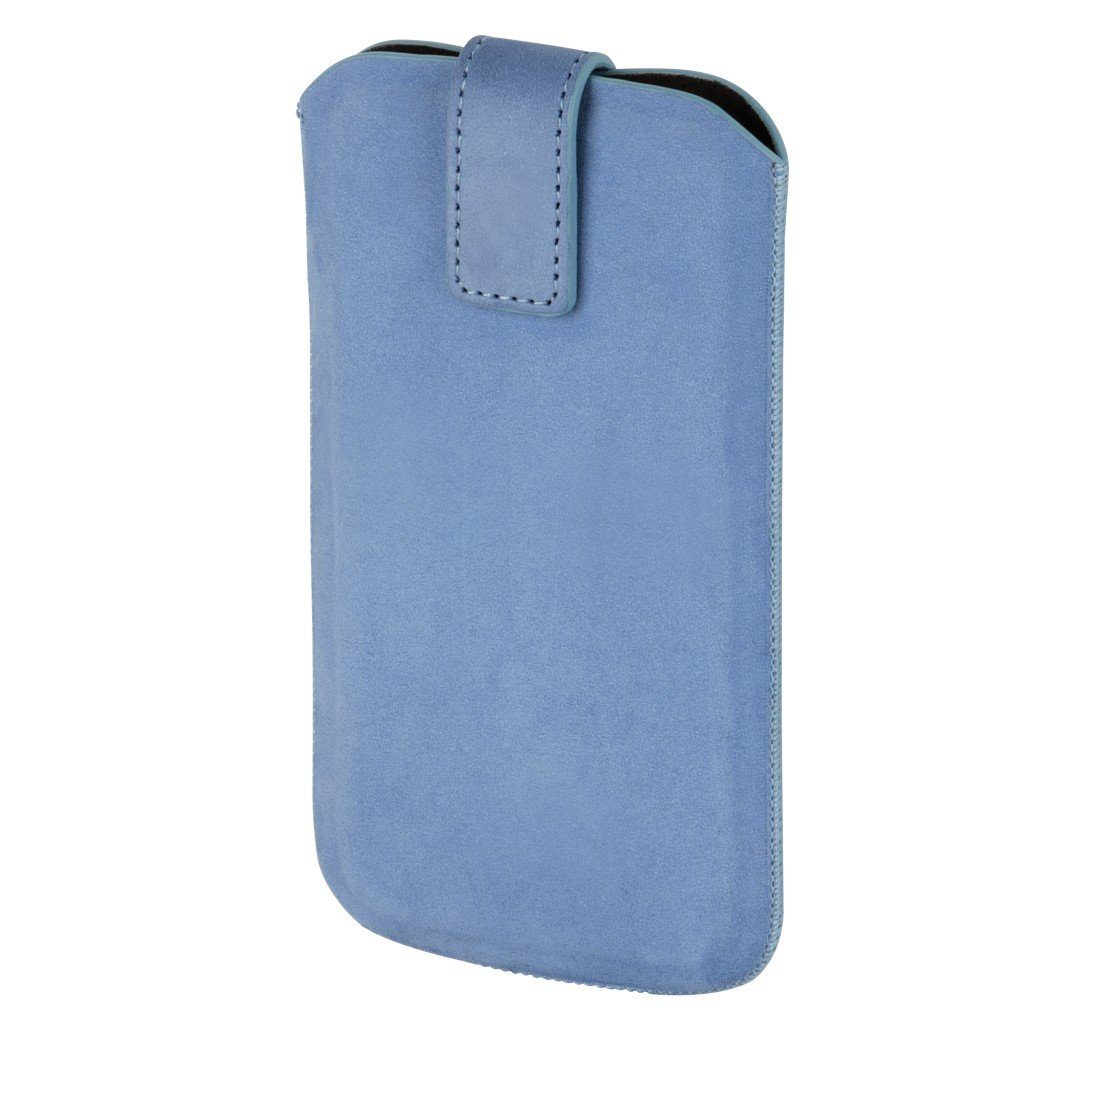 Hama Smartphone-Sleeve Chic Case, Gr. XL, Lichtblau